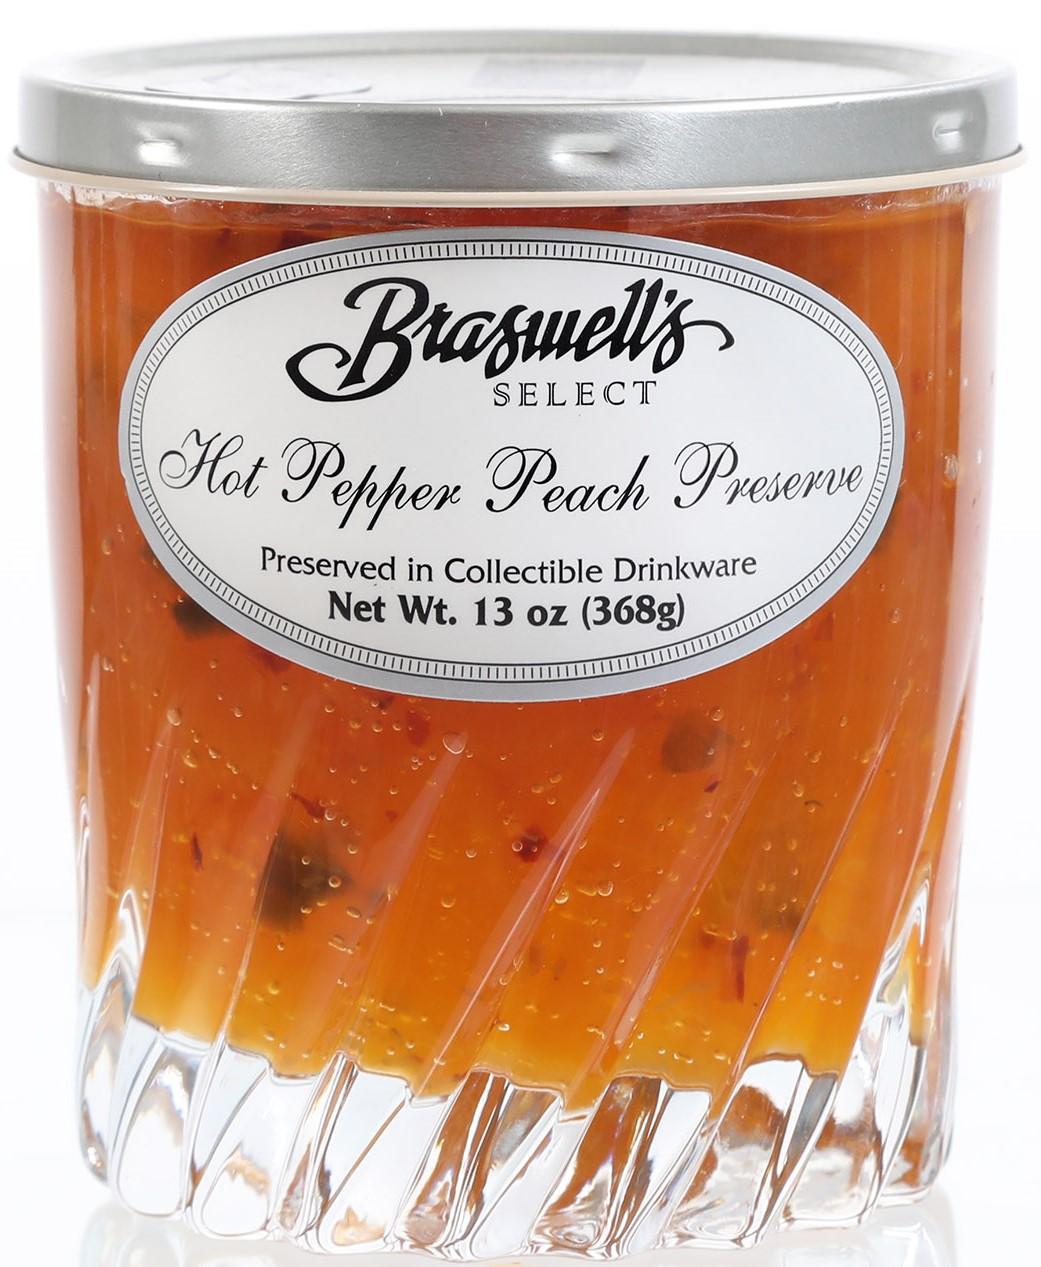 Braswell's Select Hot Pepper Peach Preserve